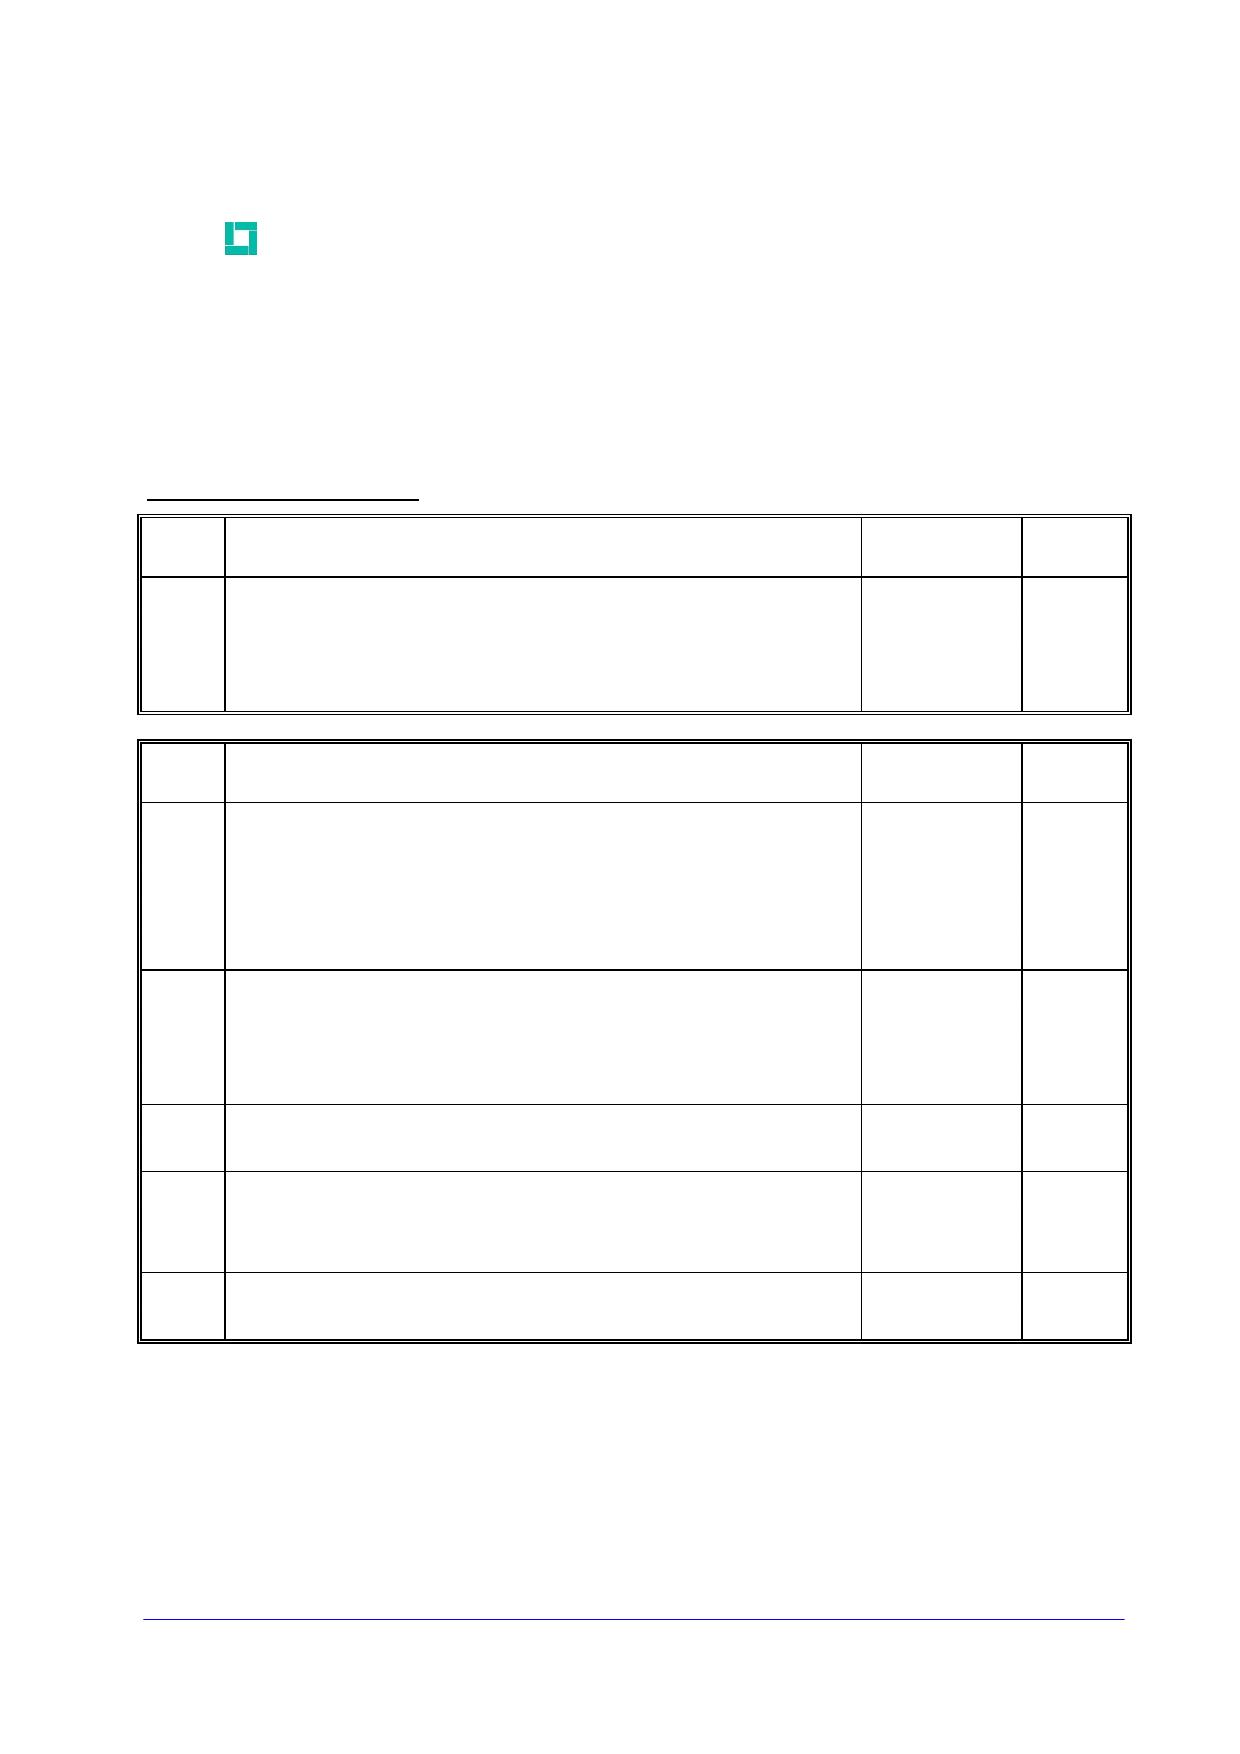 K0769NC610 datasheet